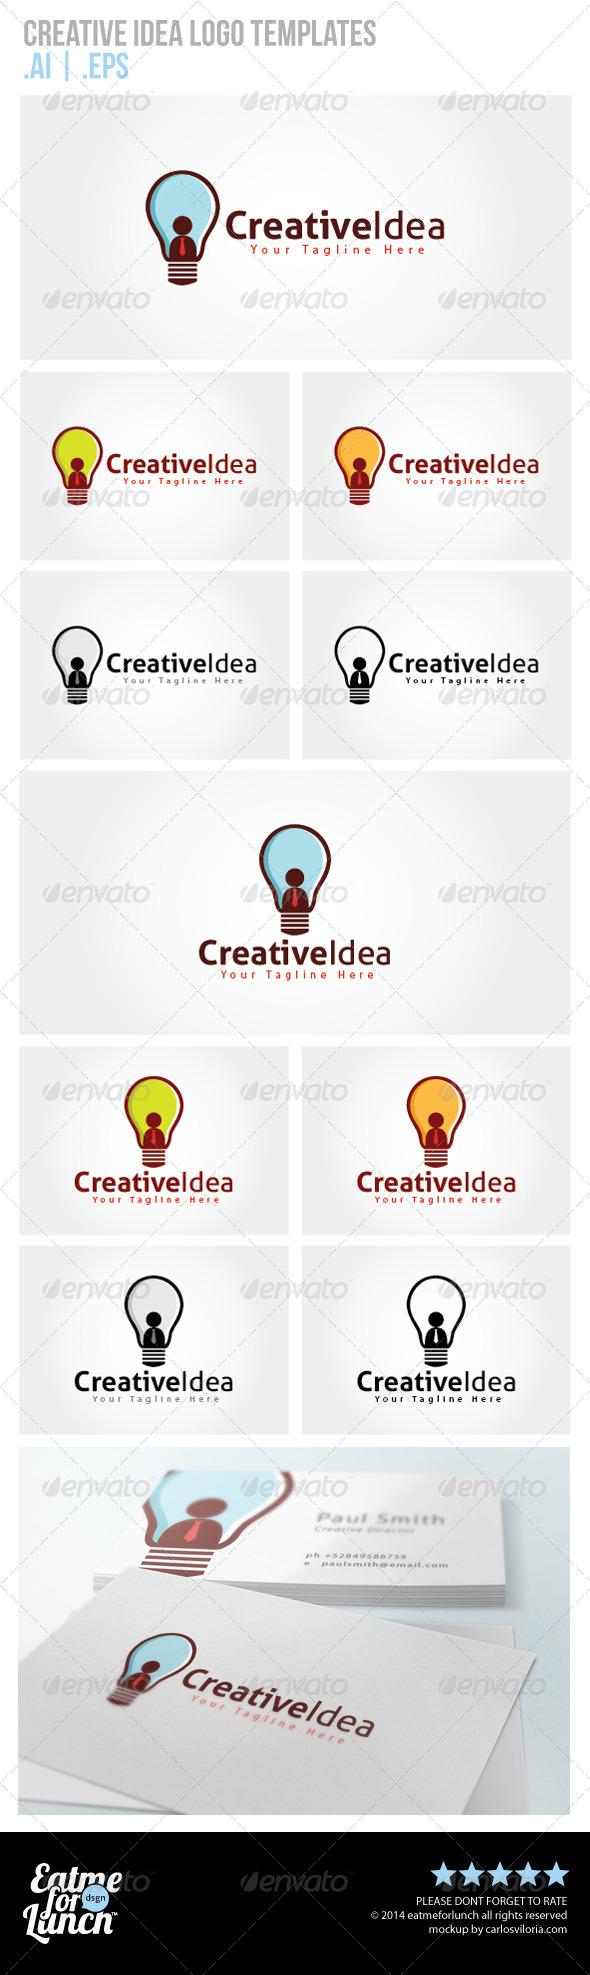 Creative Idea Logo Templates